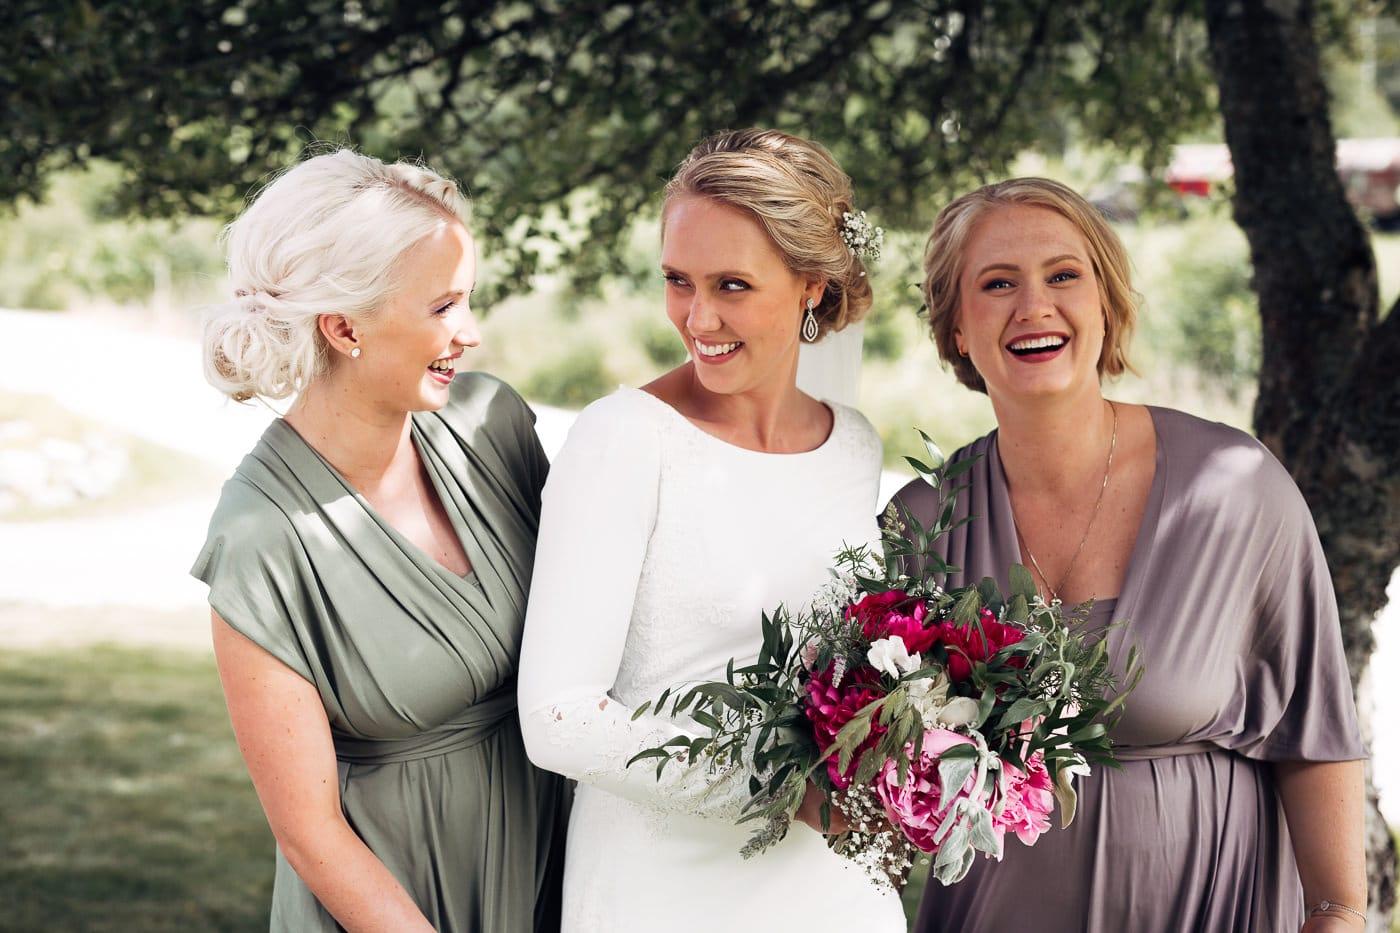 Karoline & Andreas - bryllup i Østfold med magiske detaljer Bryllup Fredrikstad Fotograf 41